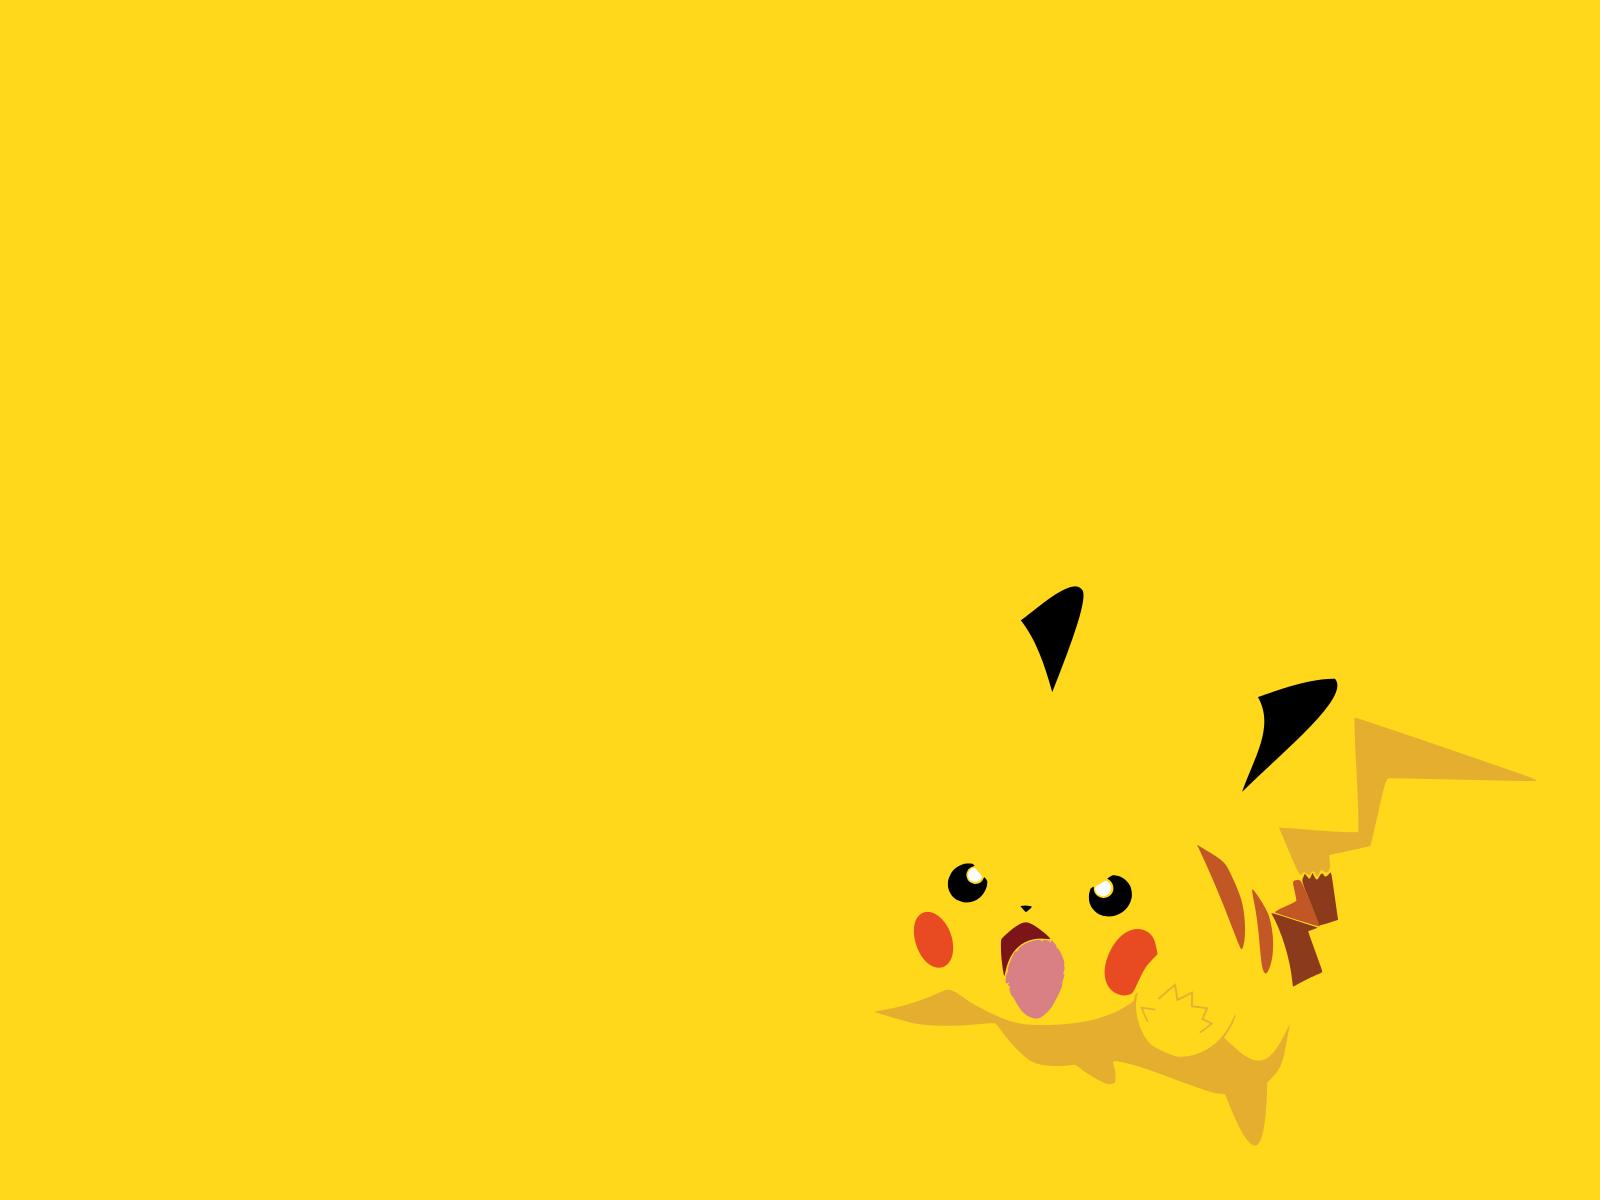 pikachu background by larsupars on deviantart